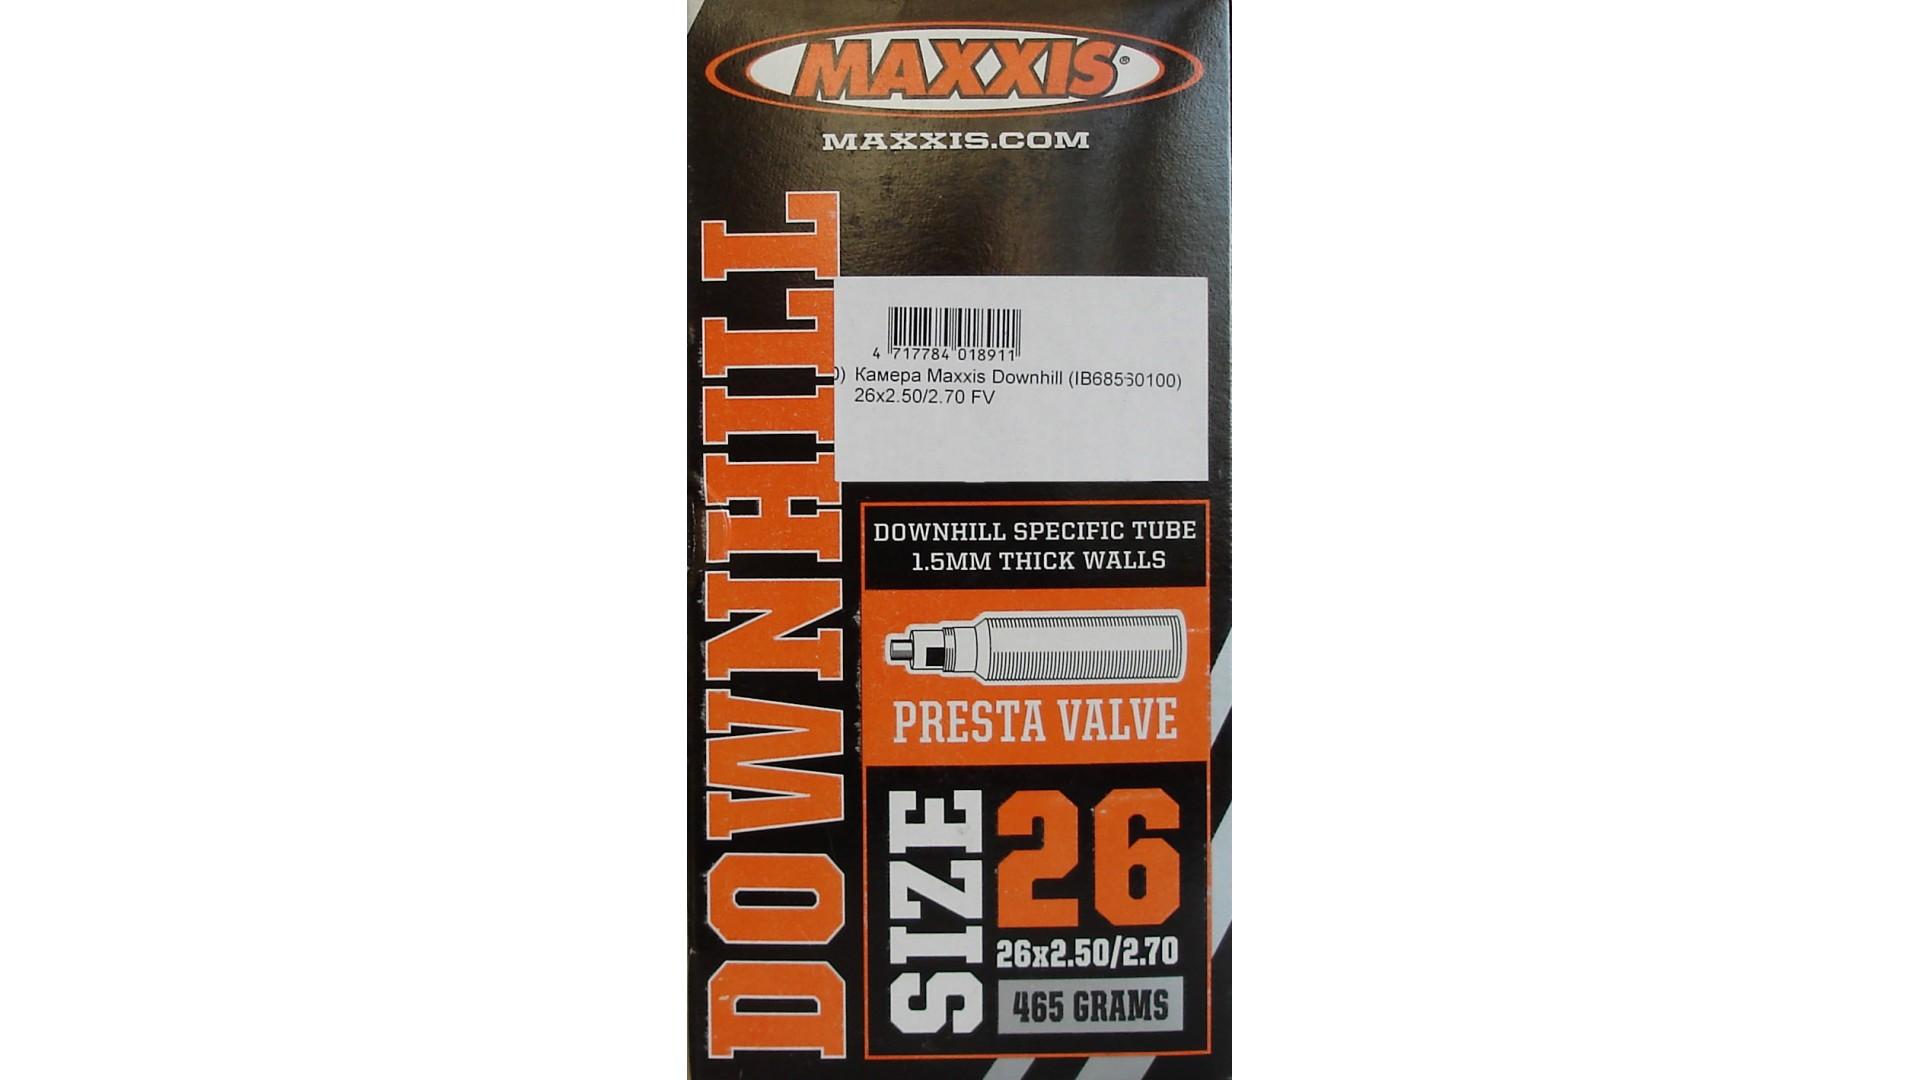 Камера Maxxis Downhill 26x2.50/2.70 FV